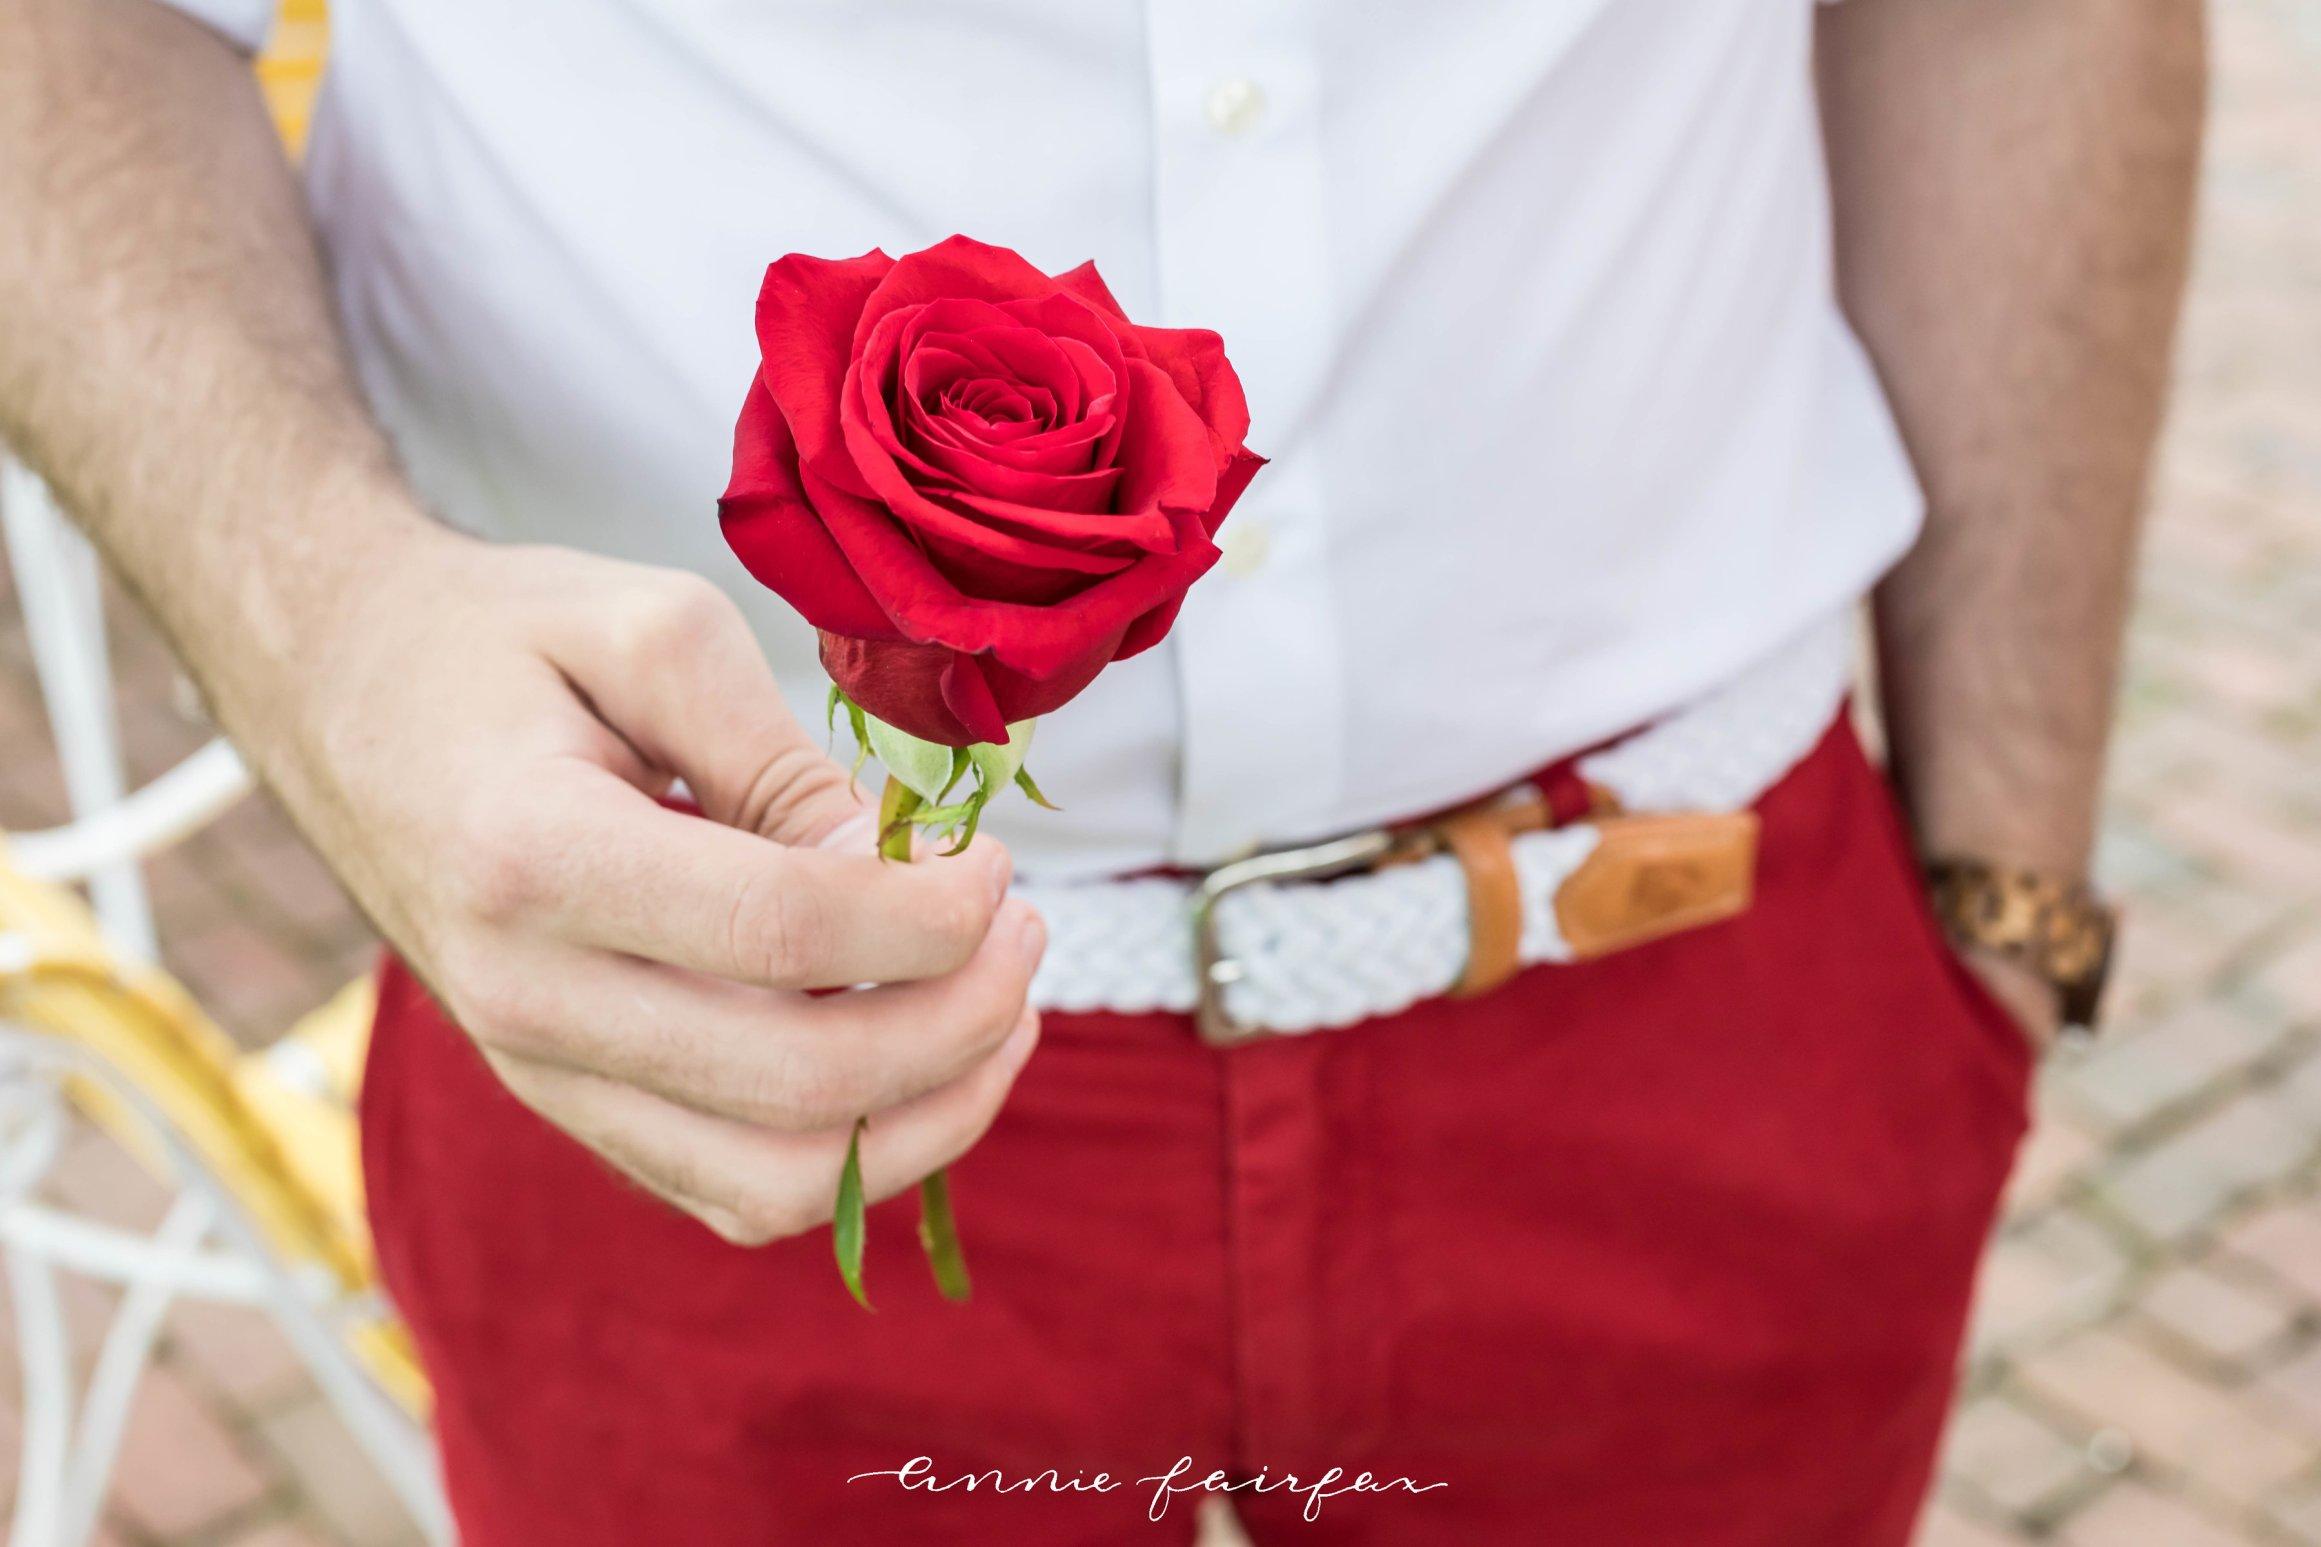 Grand Hotel Red Rose